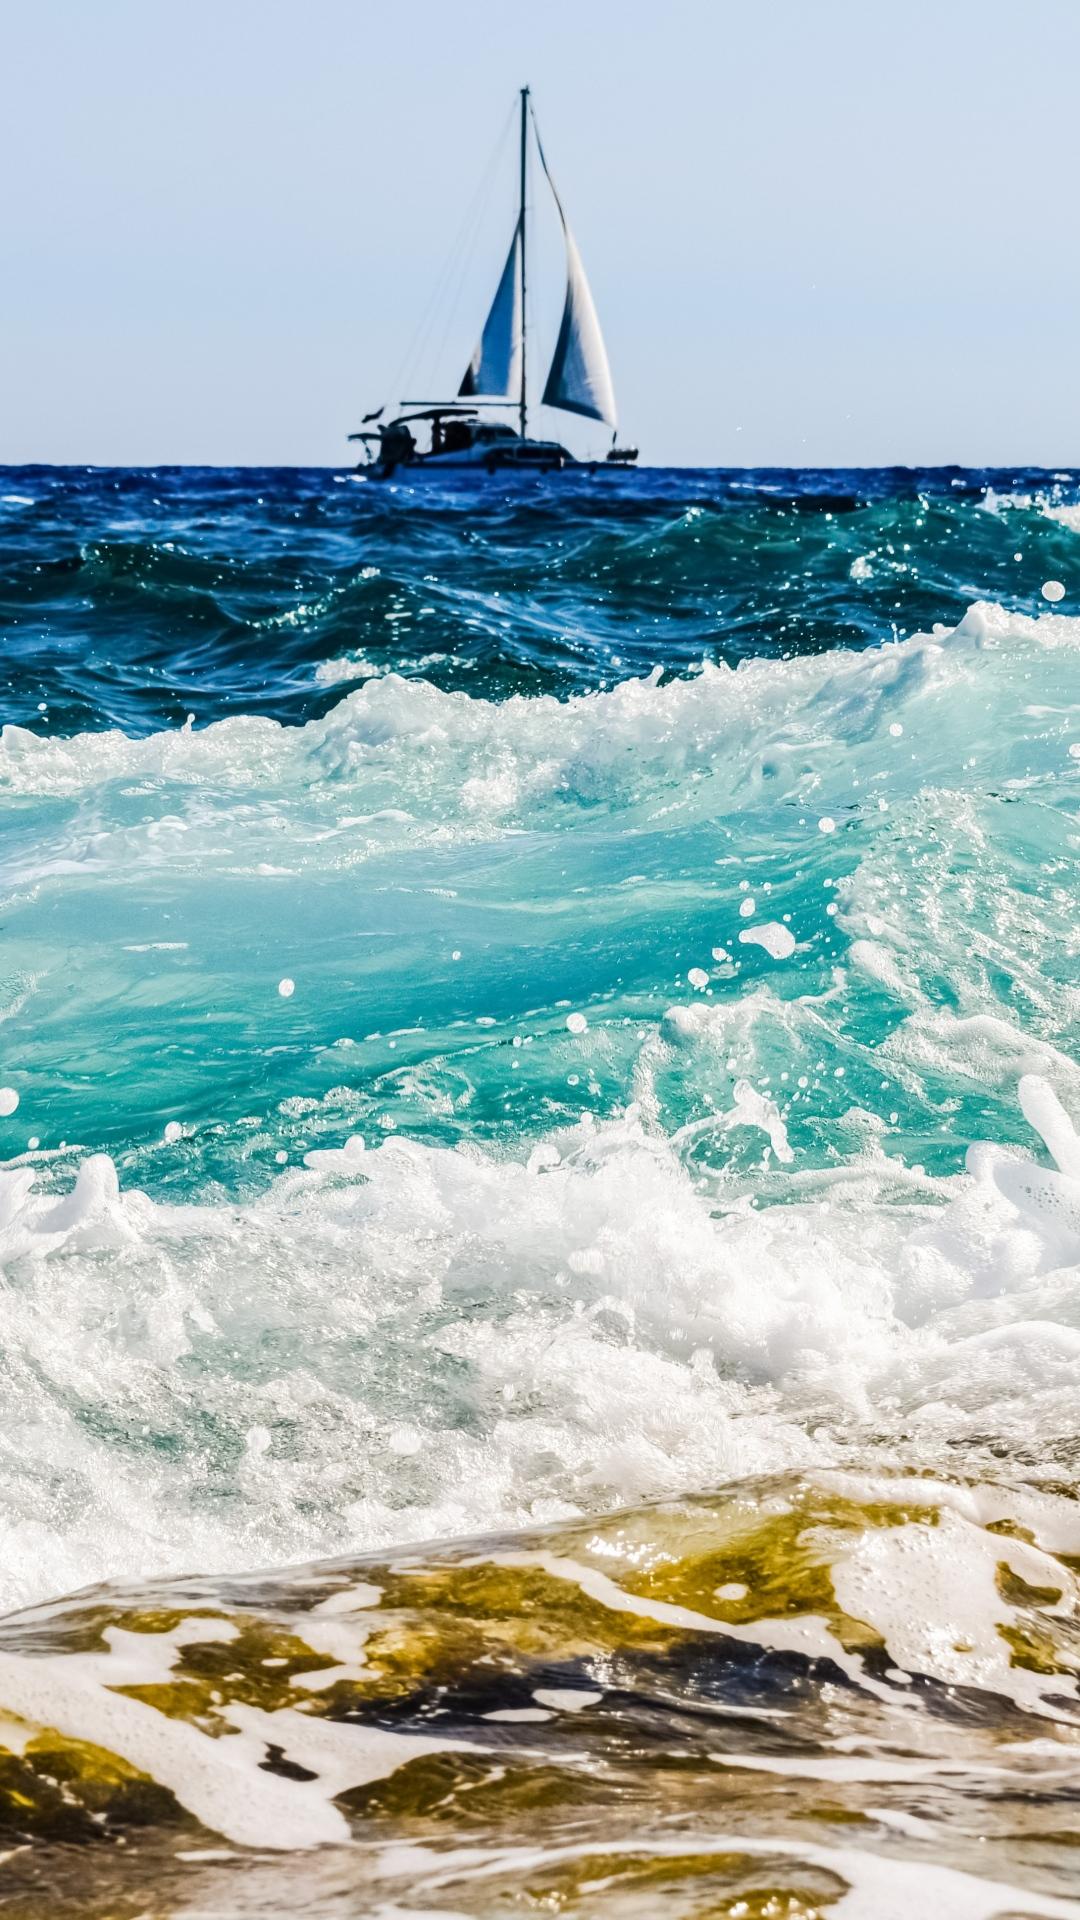 wallpaper iphone sea boat surf foam Sea